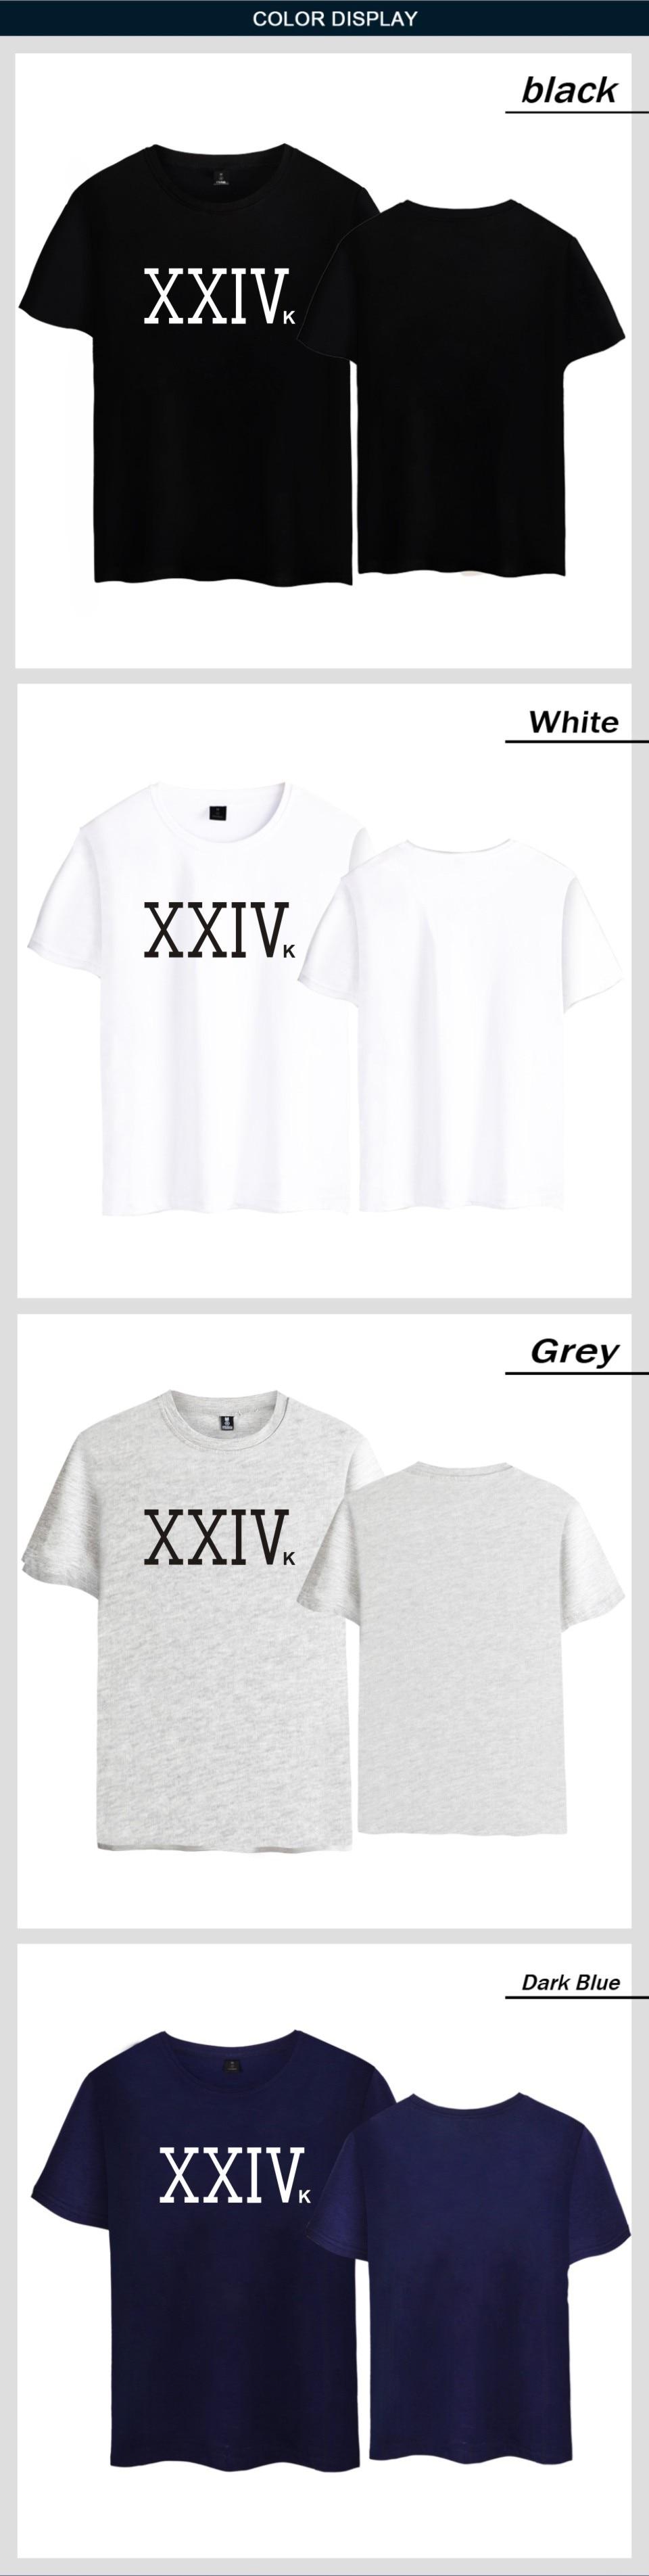 Singer-SongWriter Bruno Mars XXIVK Magic Bruno Mars T-shirt Pop Summer Bruno Mars 24K Magic T shirt XXIVK Short Sleeve Tees